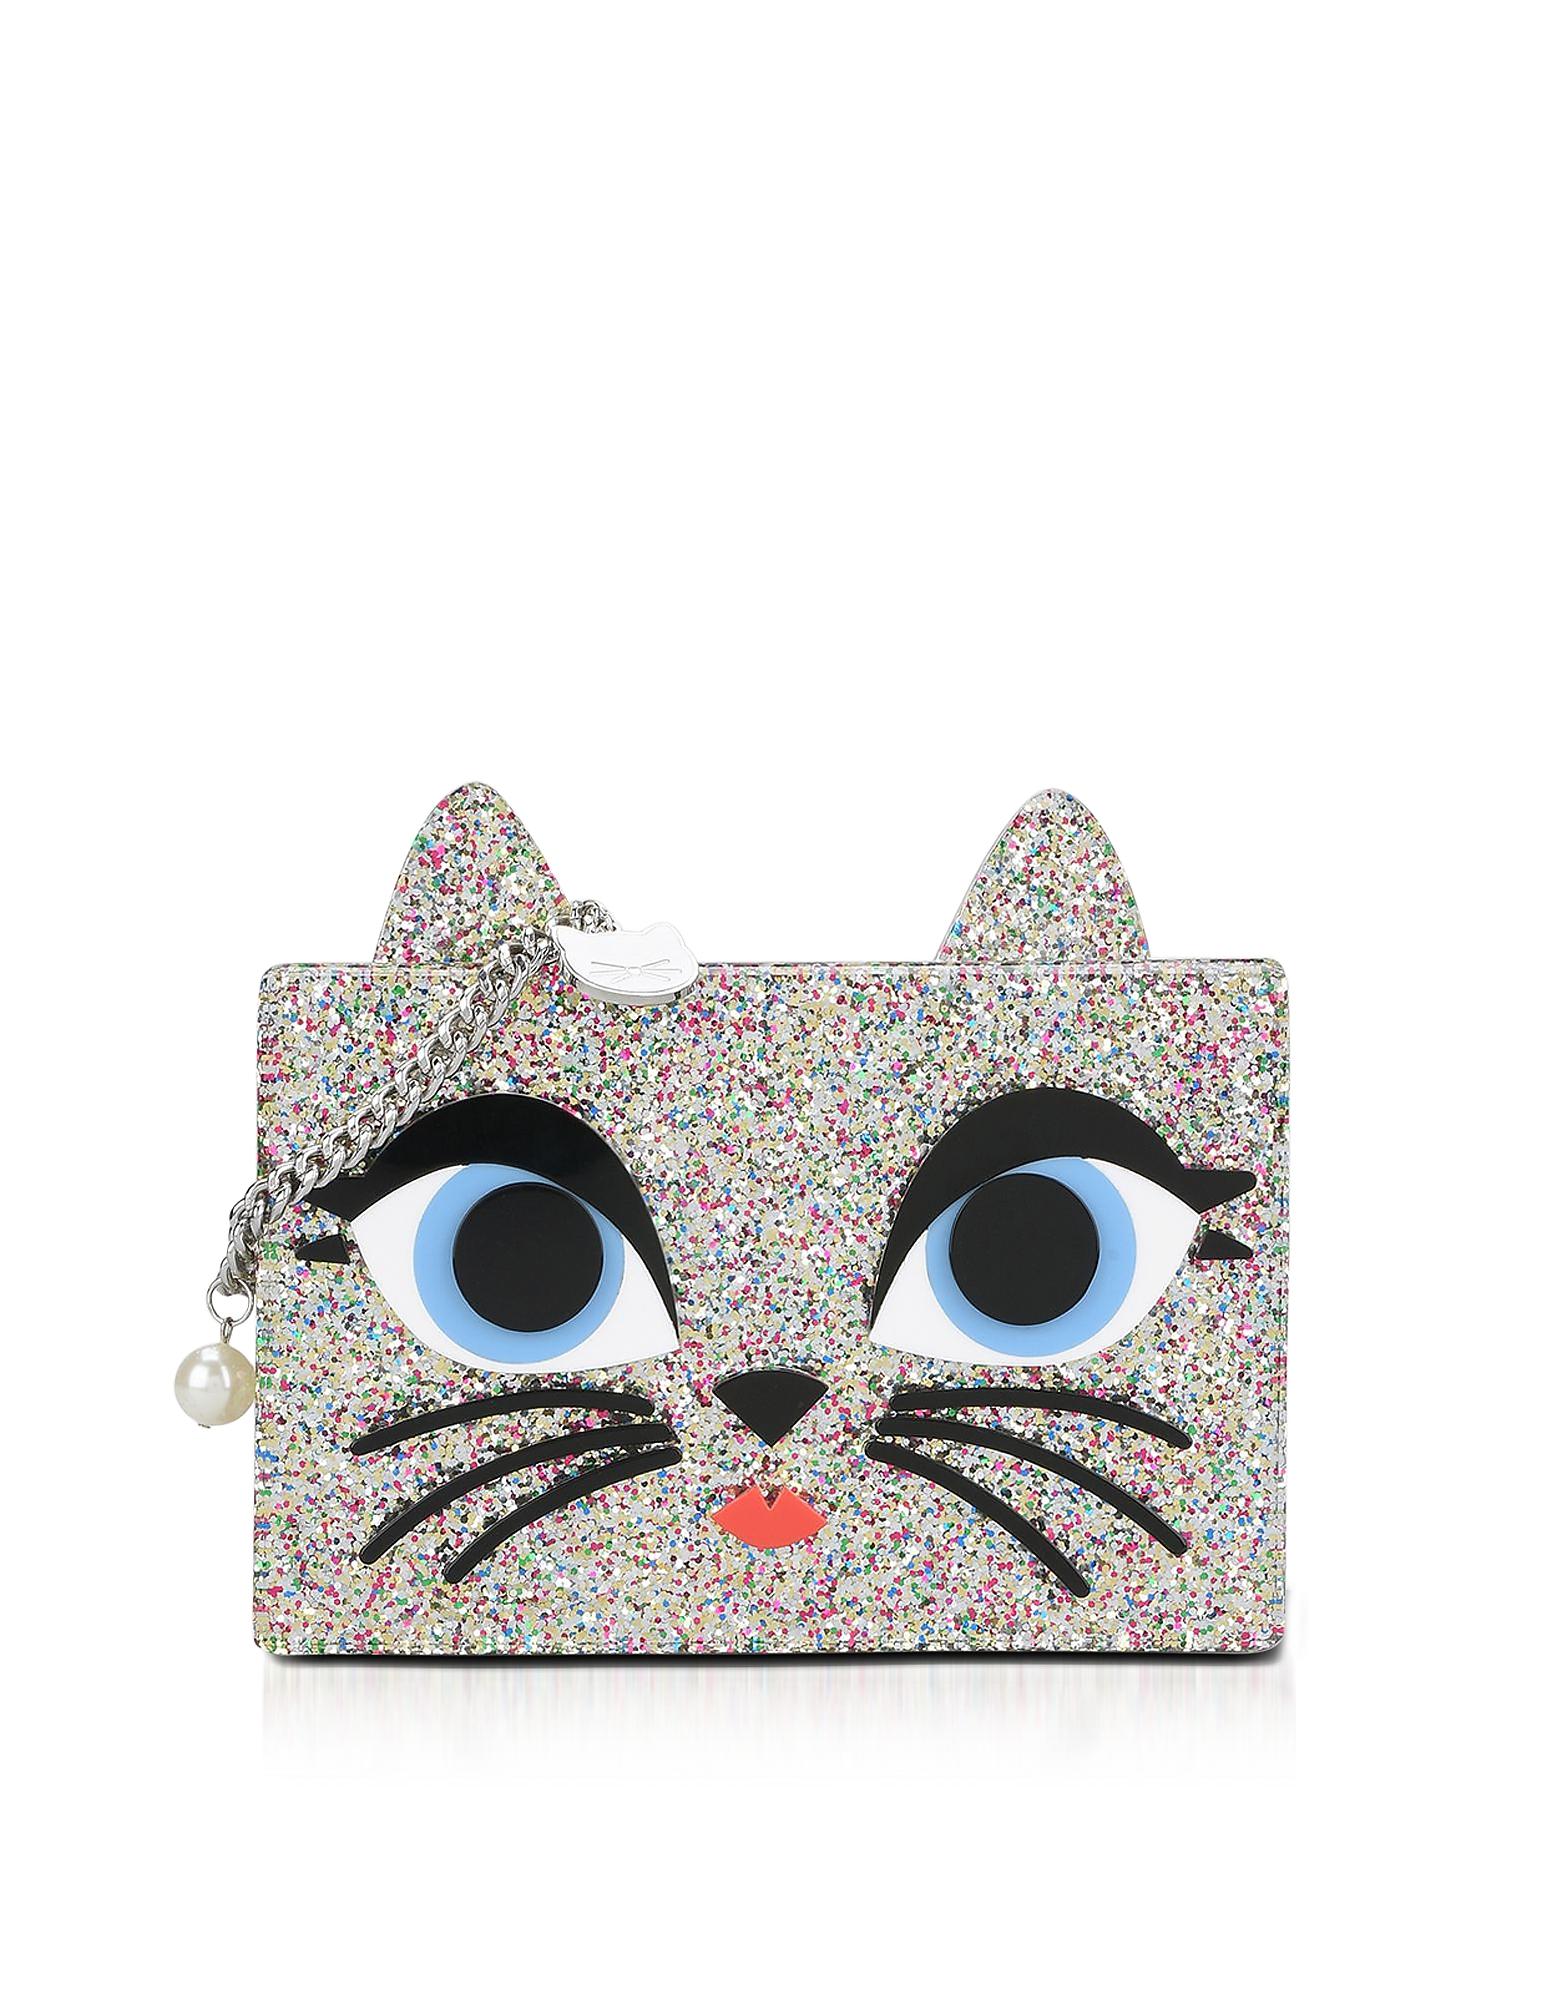 Karl Lagerfeld Handbags, Choupette Box Clutch